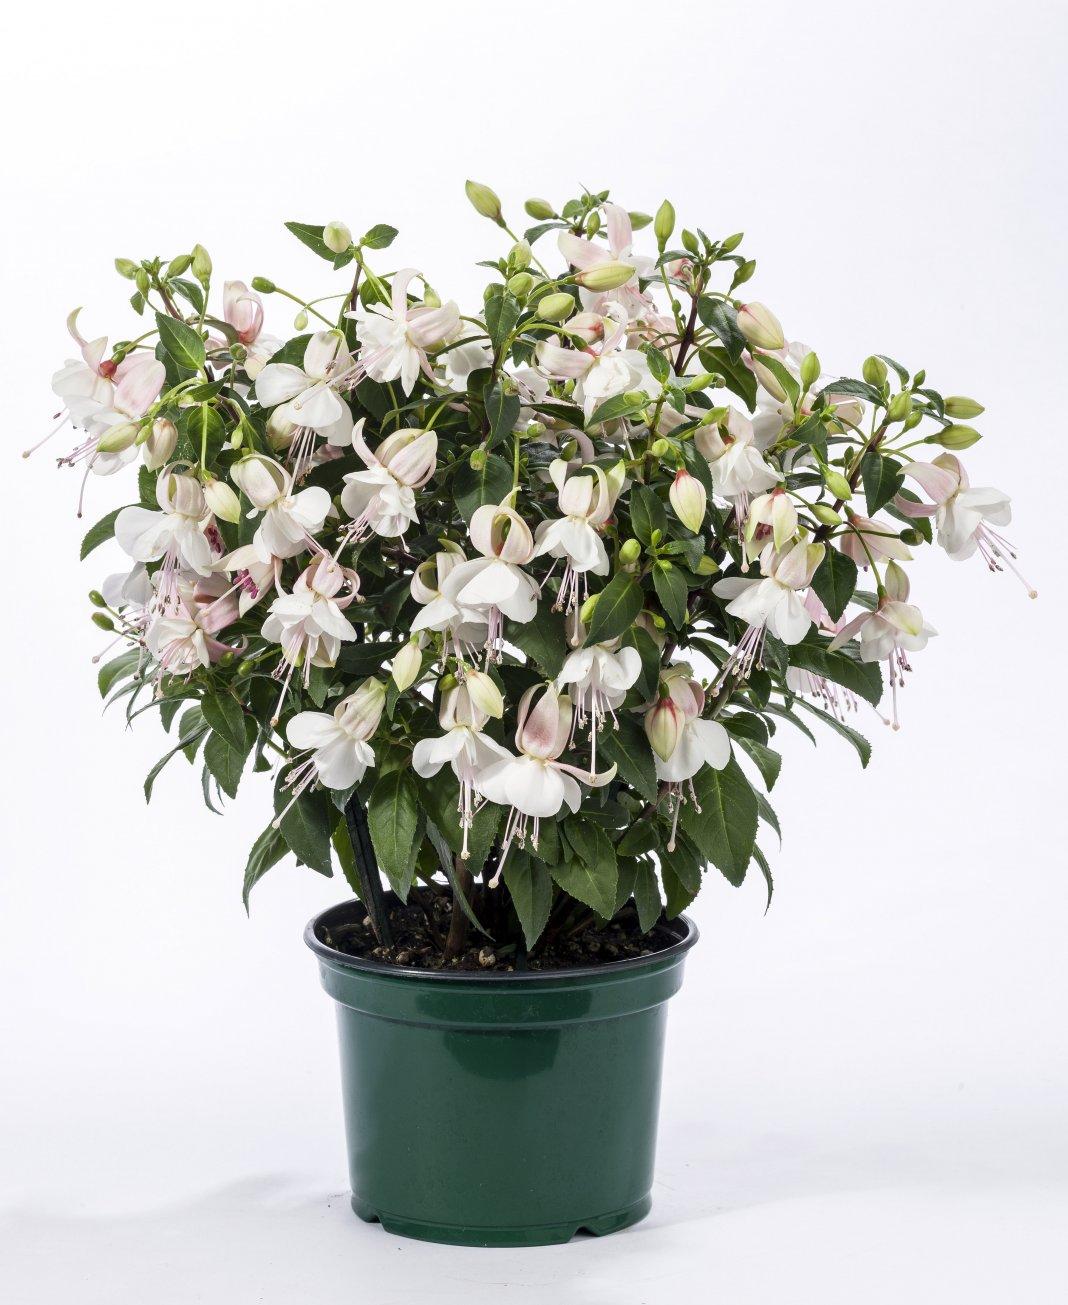 http://www.botanichka.ru/wp-content/uploads/2017/02/Fuchsia-2.jpg